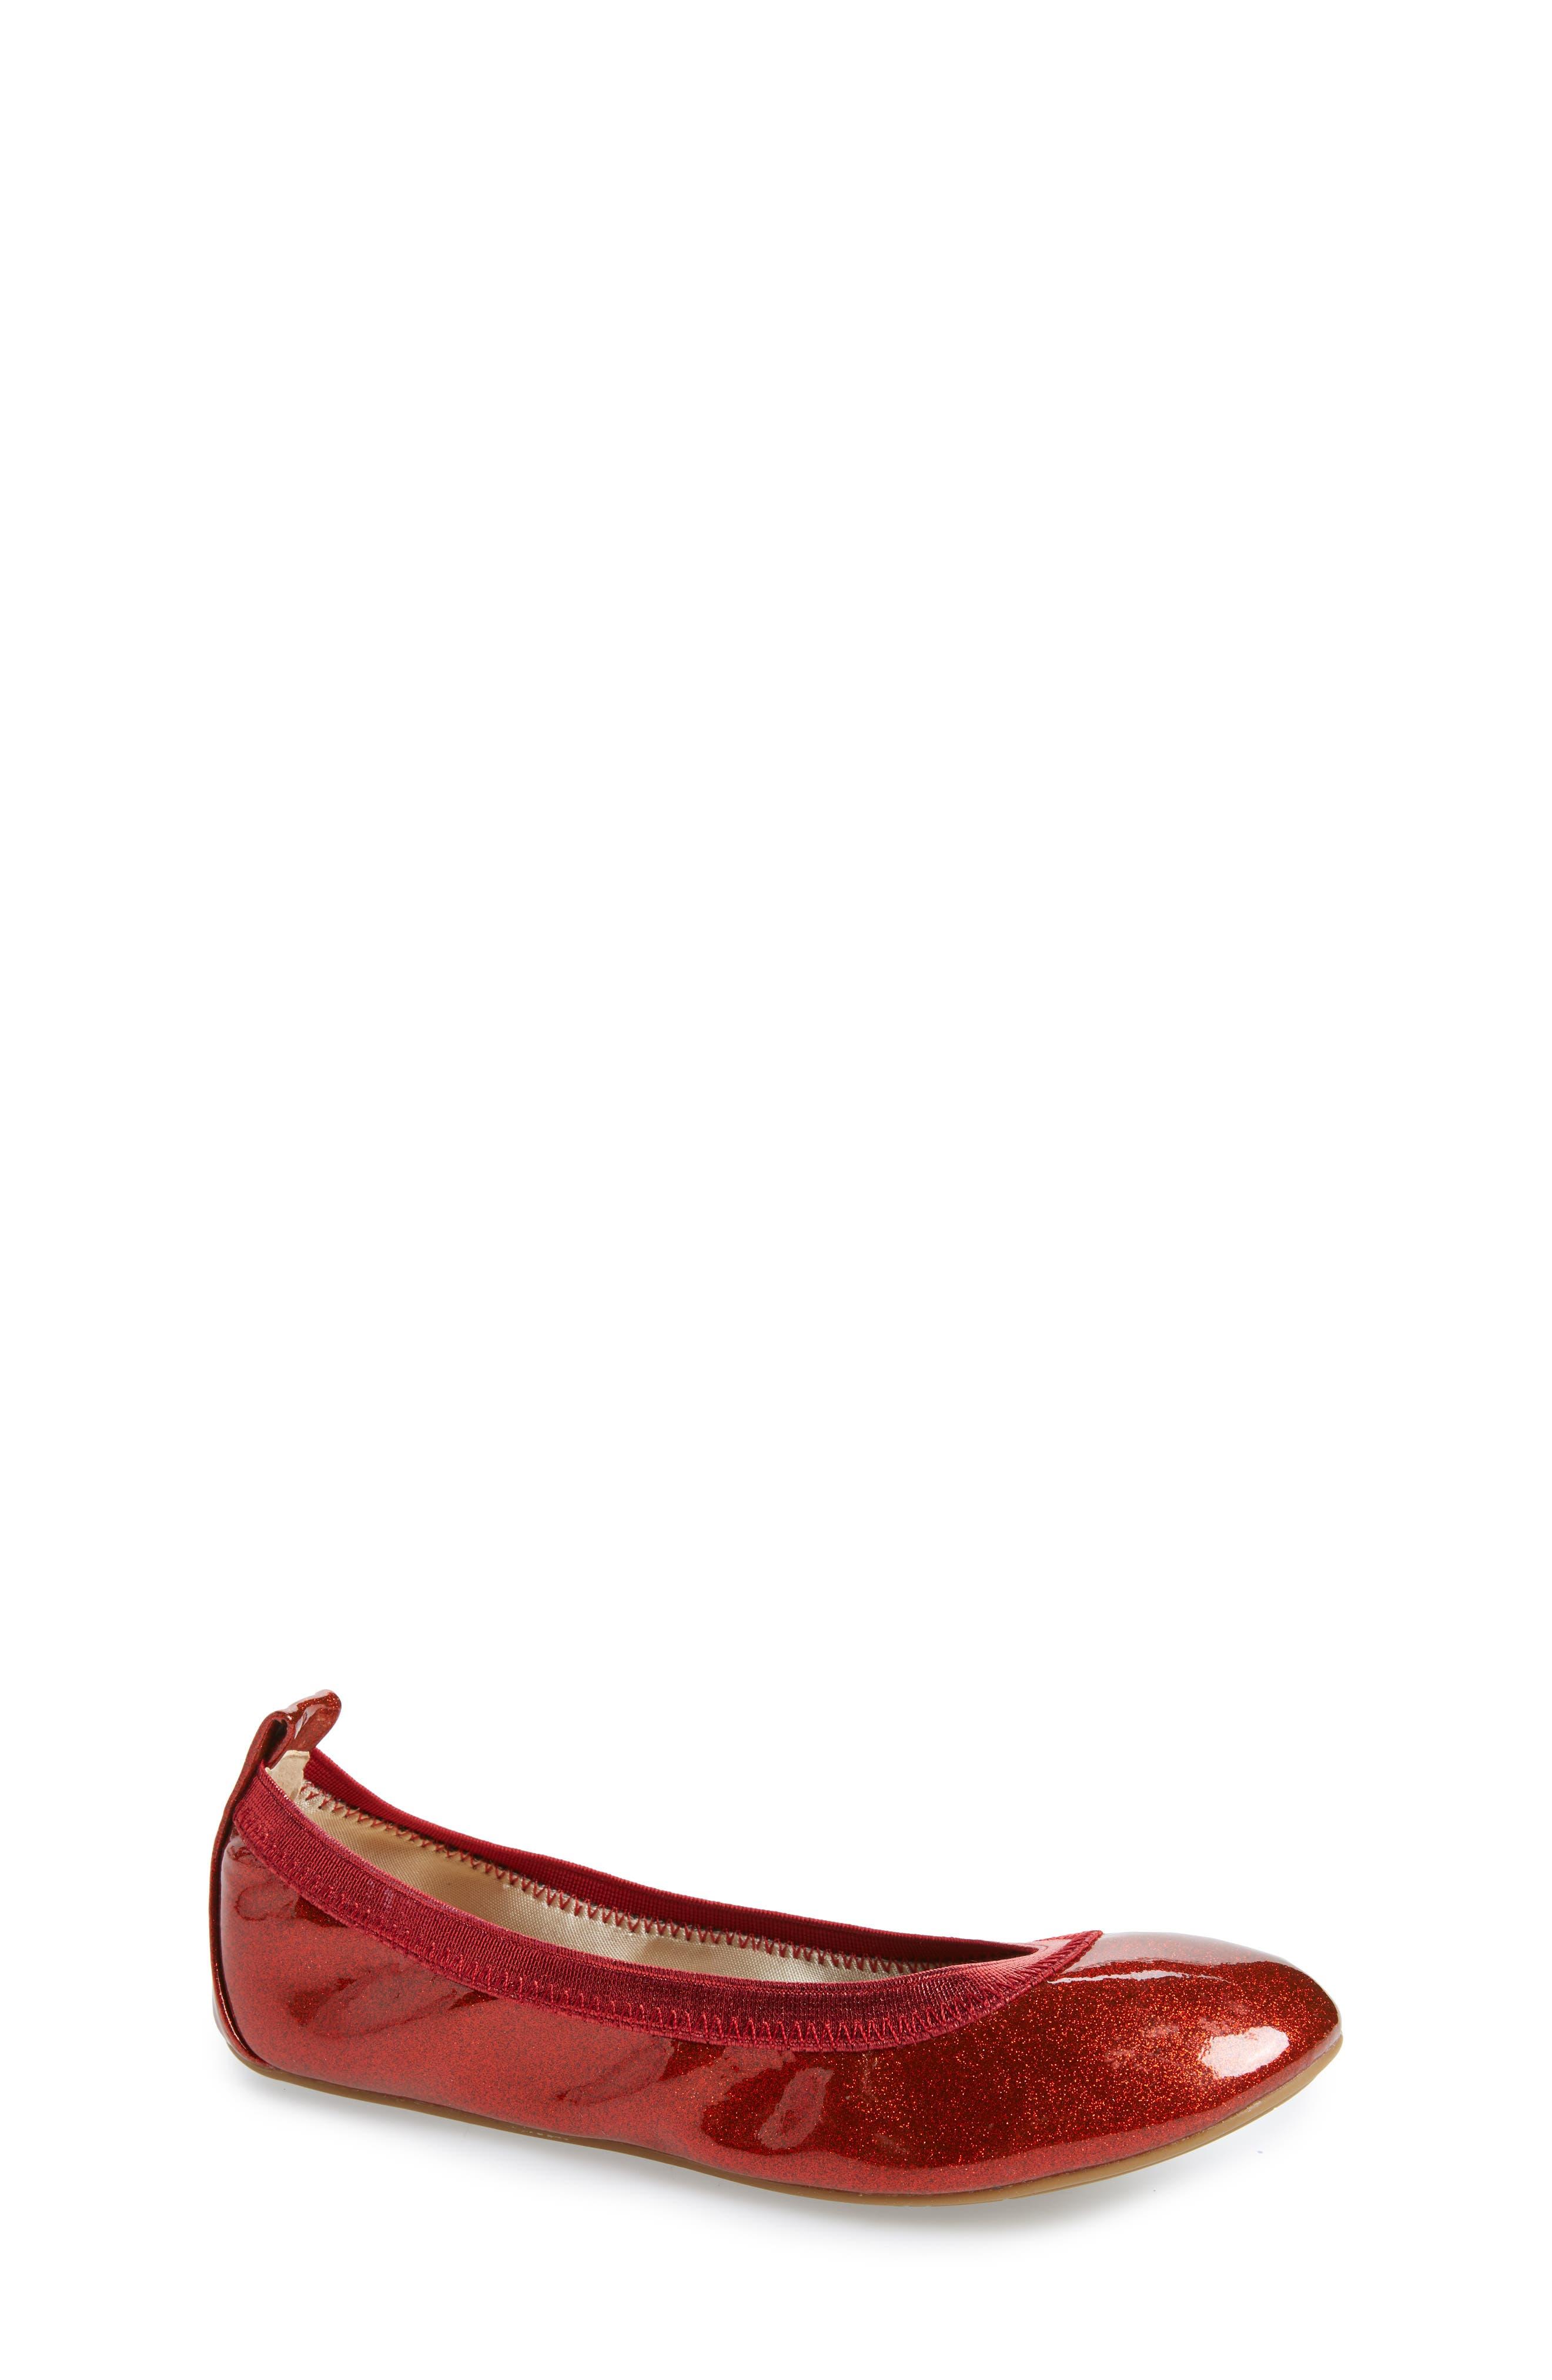 Miss Samara Ballet Flat,                             Main thumbnail 1, color,                             RED PATENT GLITTER